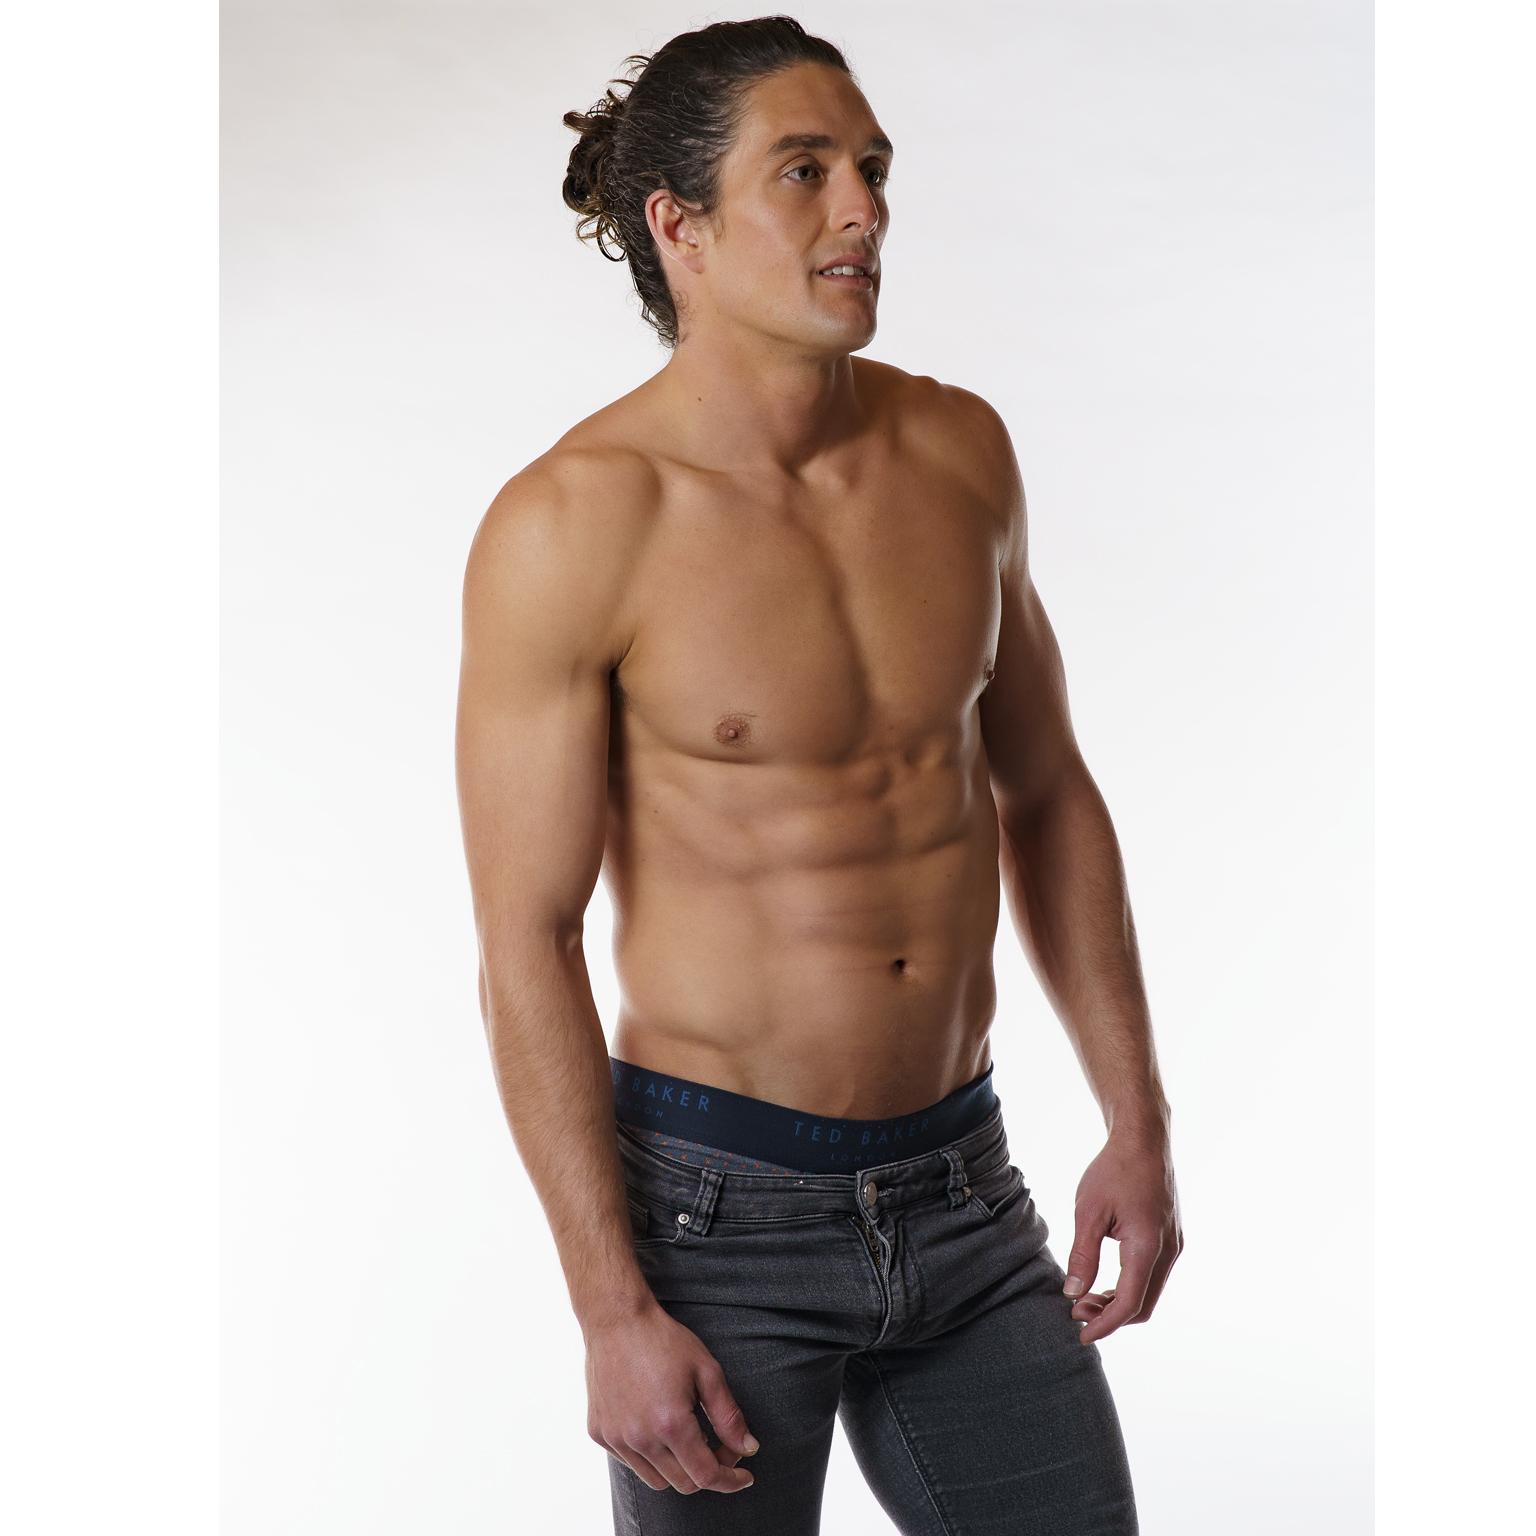 Toronto-Fitness-Model-Agency-Fitness-Casual-Commercial-Brad-Bedard-Fashion-Model-Fitness